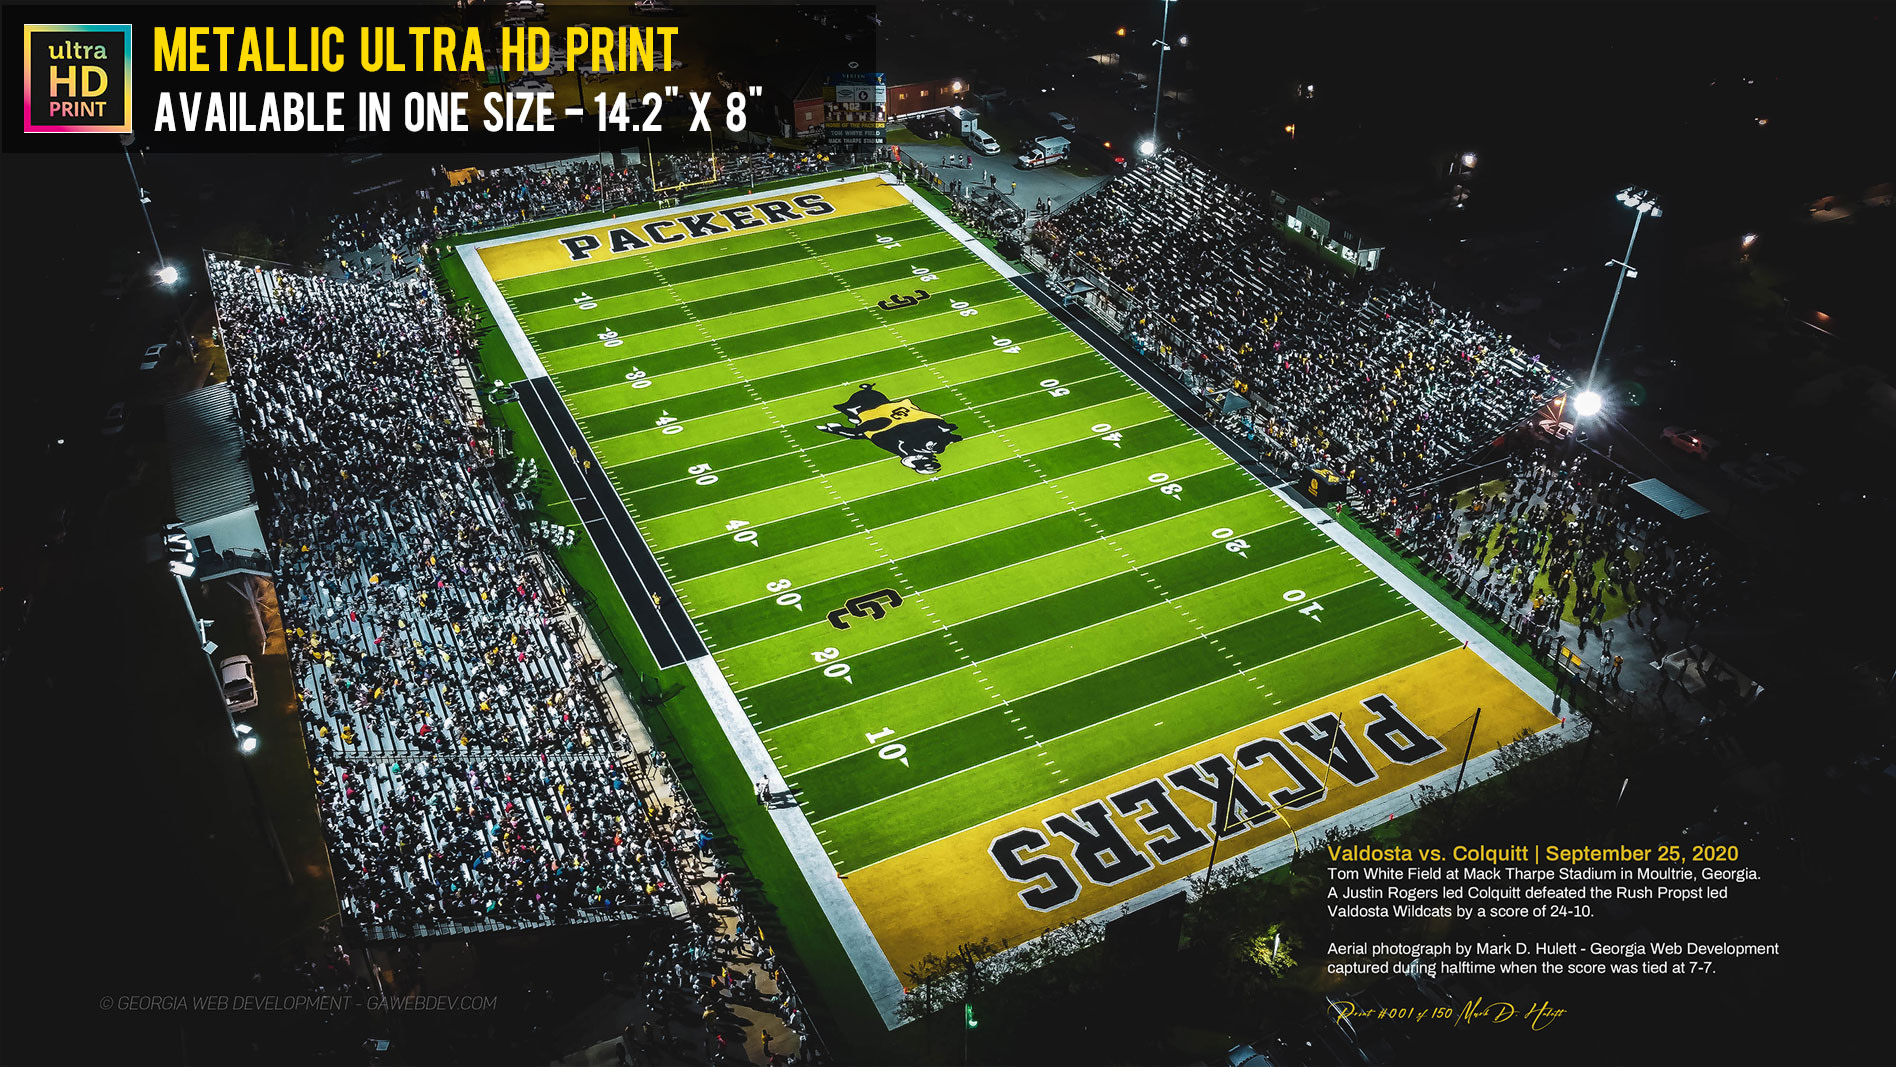 ultra-hd-prints-valdosta-vs-colquitt-2020-stadium-shot